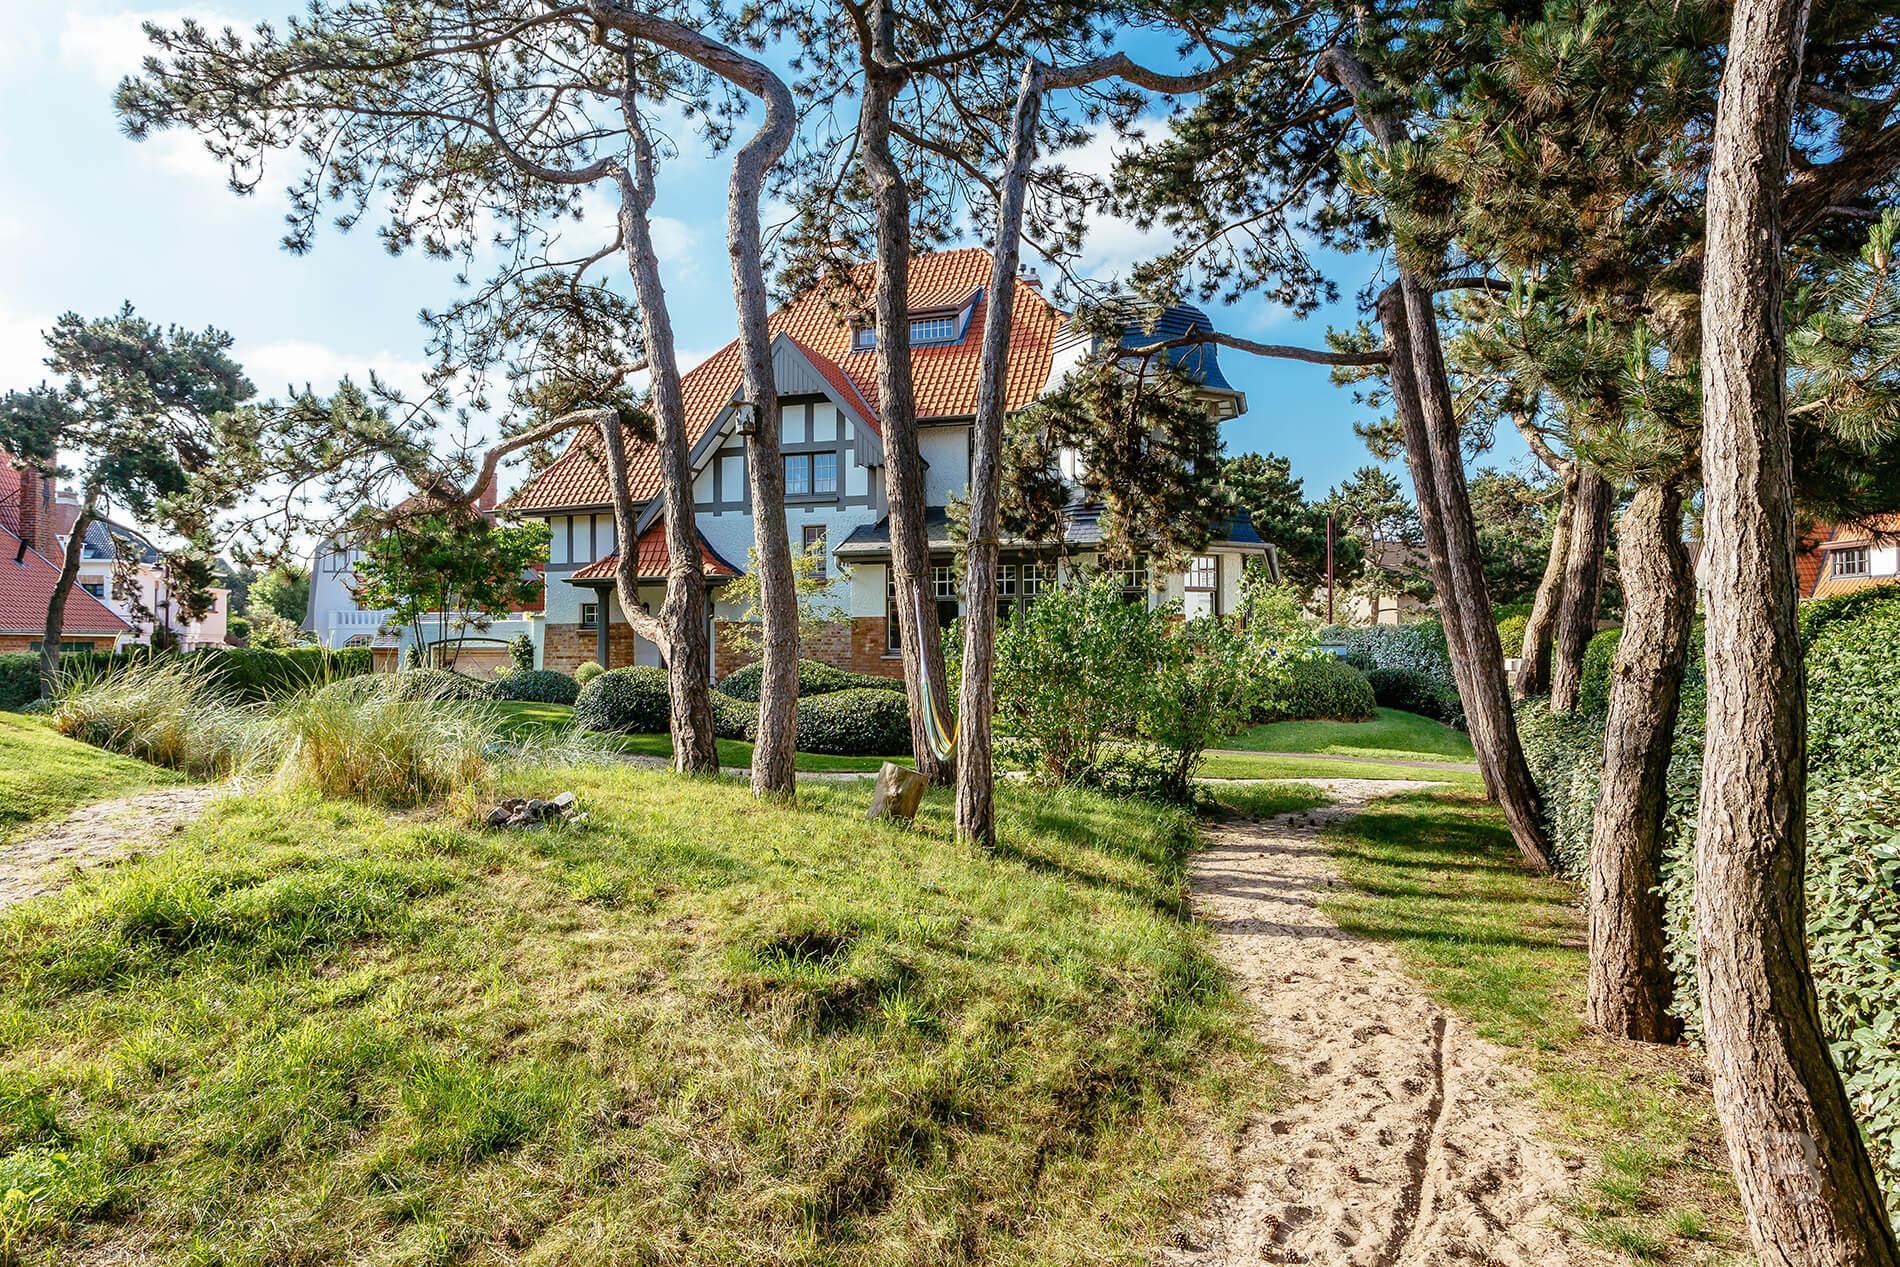 Afbeelding project Tijdloze tuin rond typische concessie woning